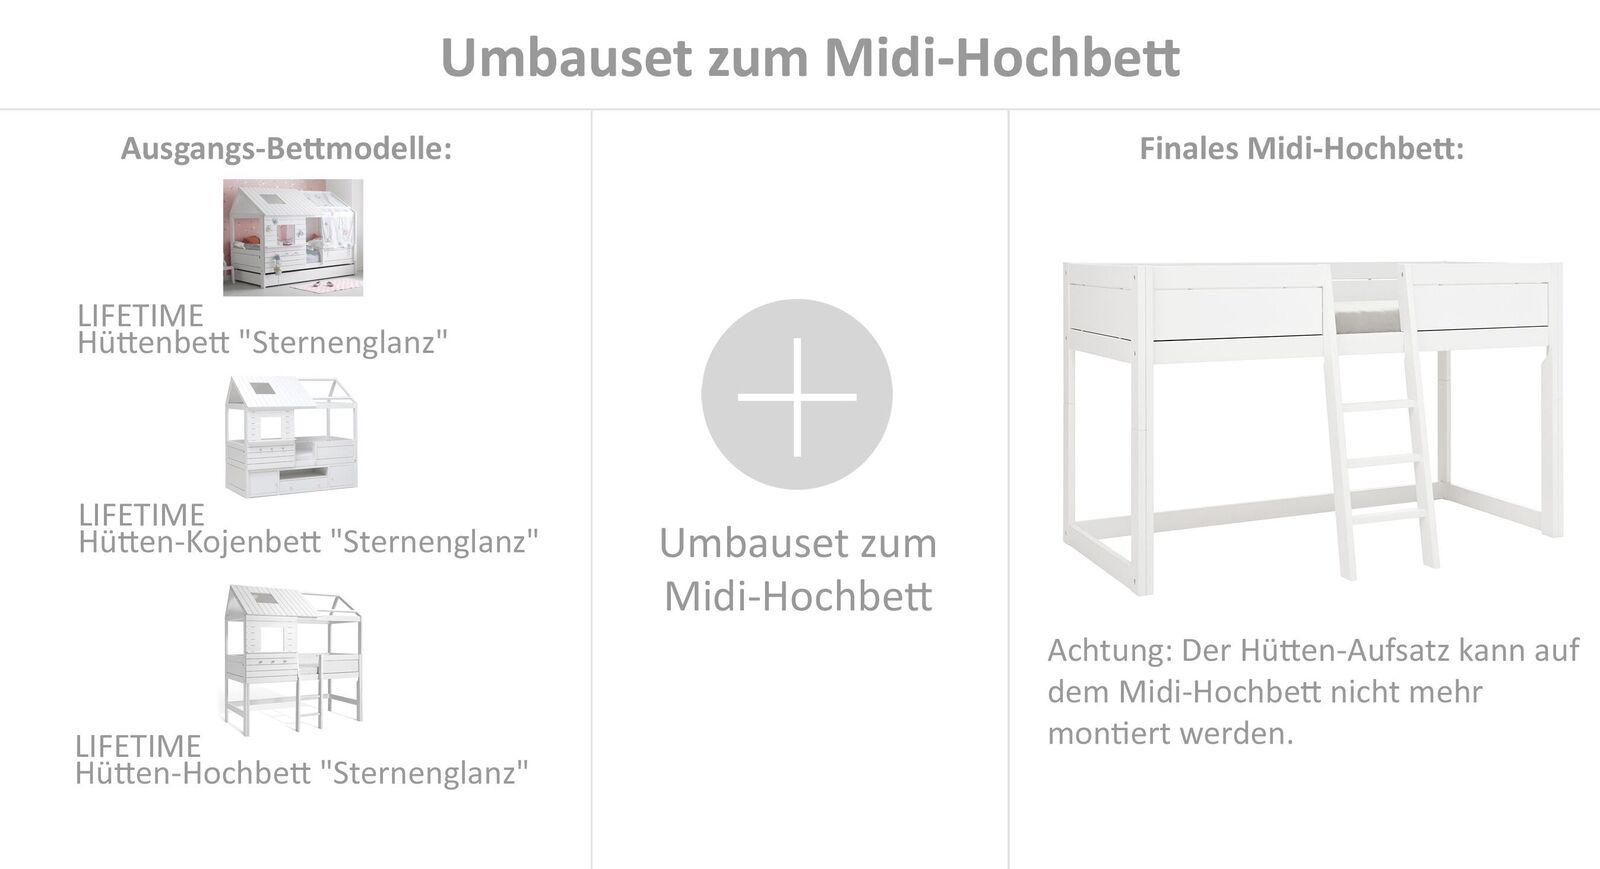 Stabiles LIFETIME Umbauset Sternenglanz zum Midi-Hochbett